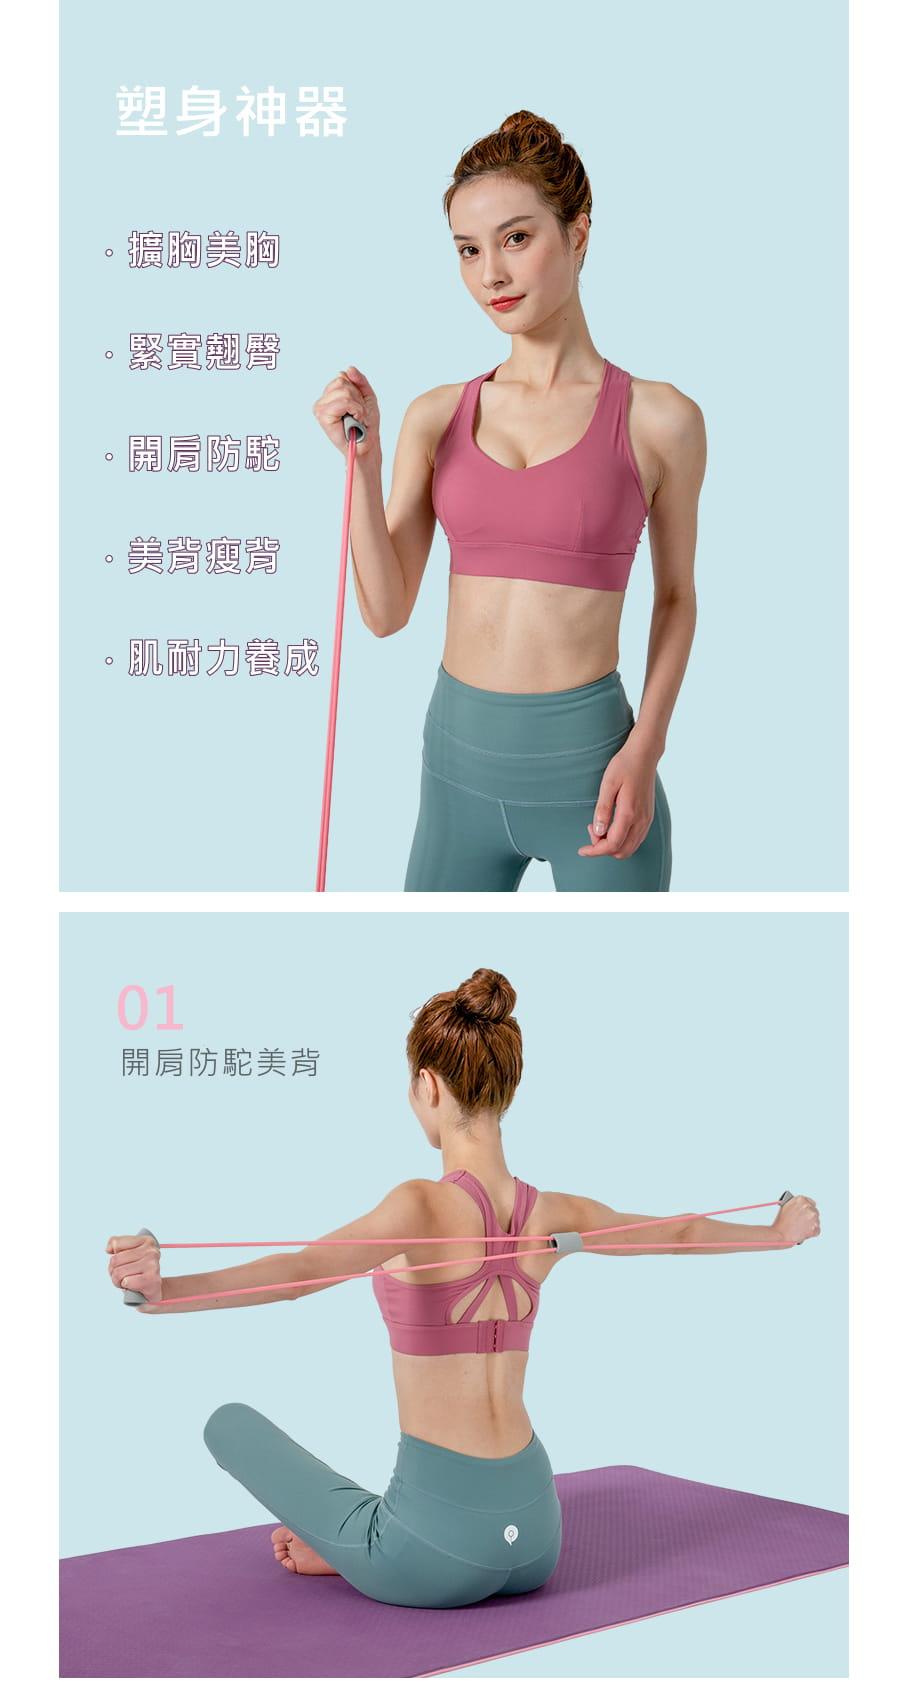 【Un-Sport高機能】Fitness Kit女力健身超值套組(8字拉力帶+瑜珈環) 1